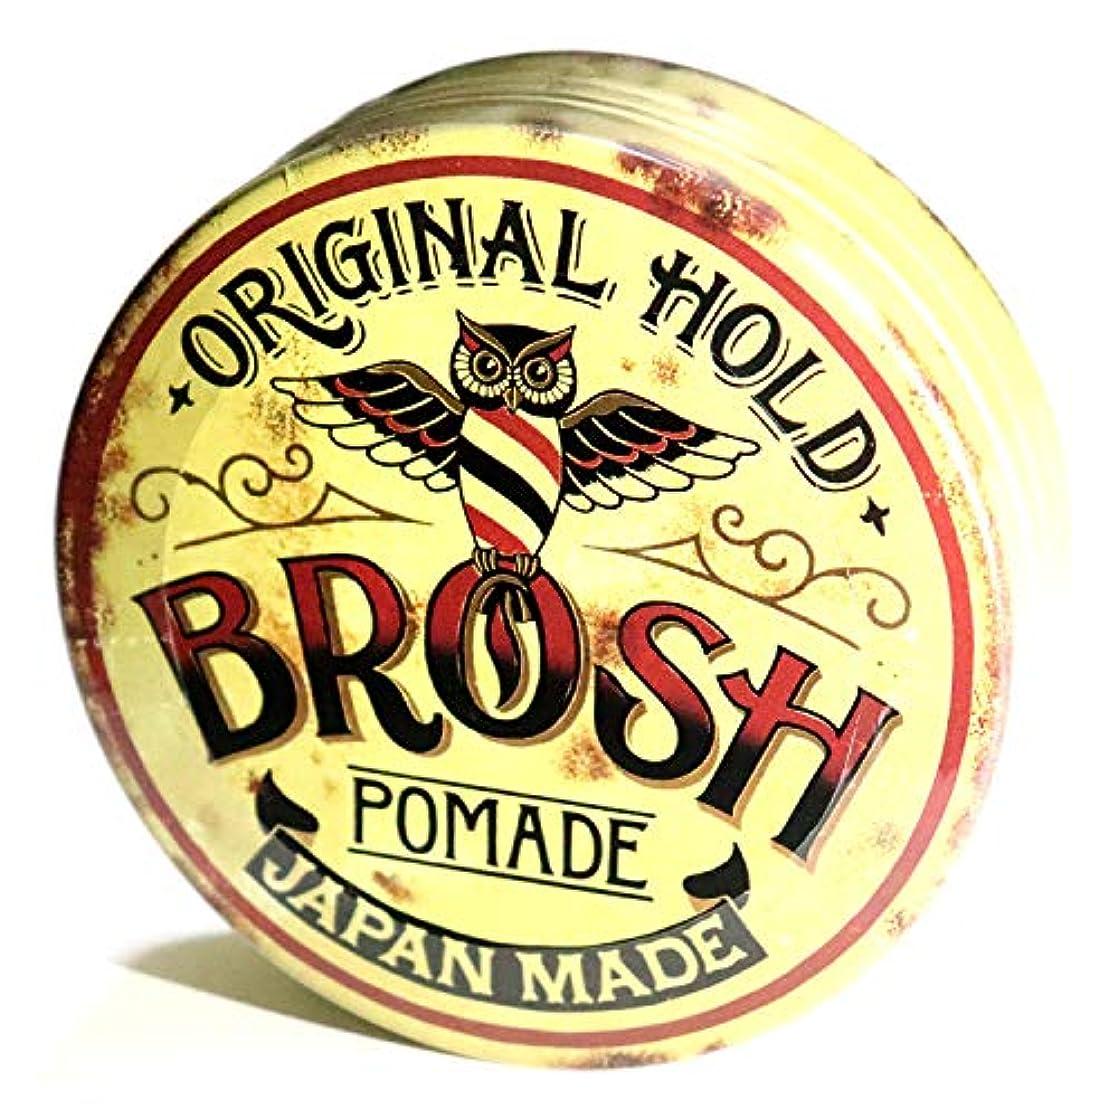 BROSH (ブロッシュ) BROSH POMADE ORIGINAL HOLD 115g 水性ポマード 整髪料